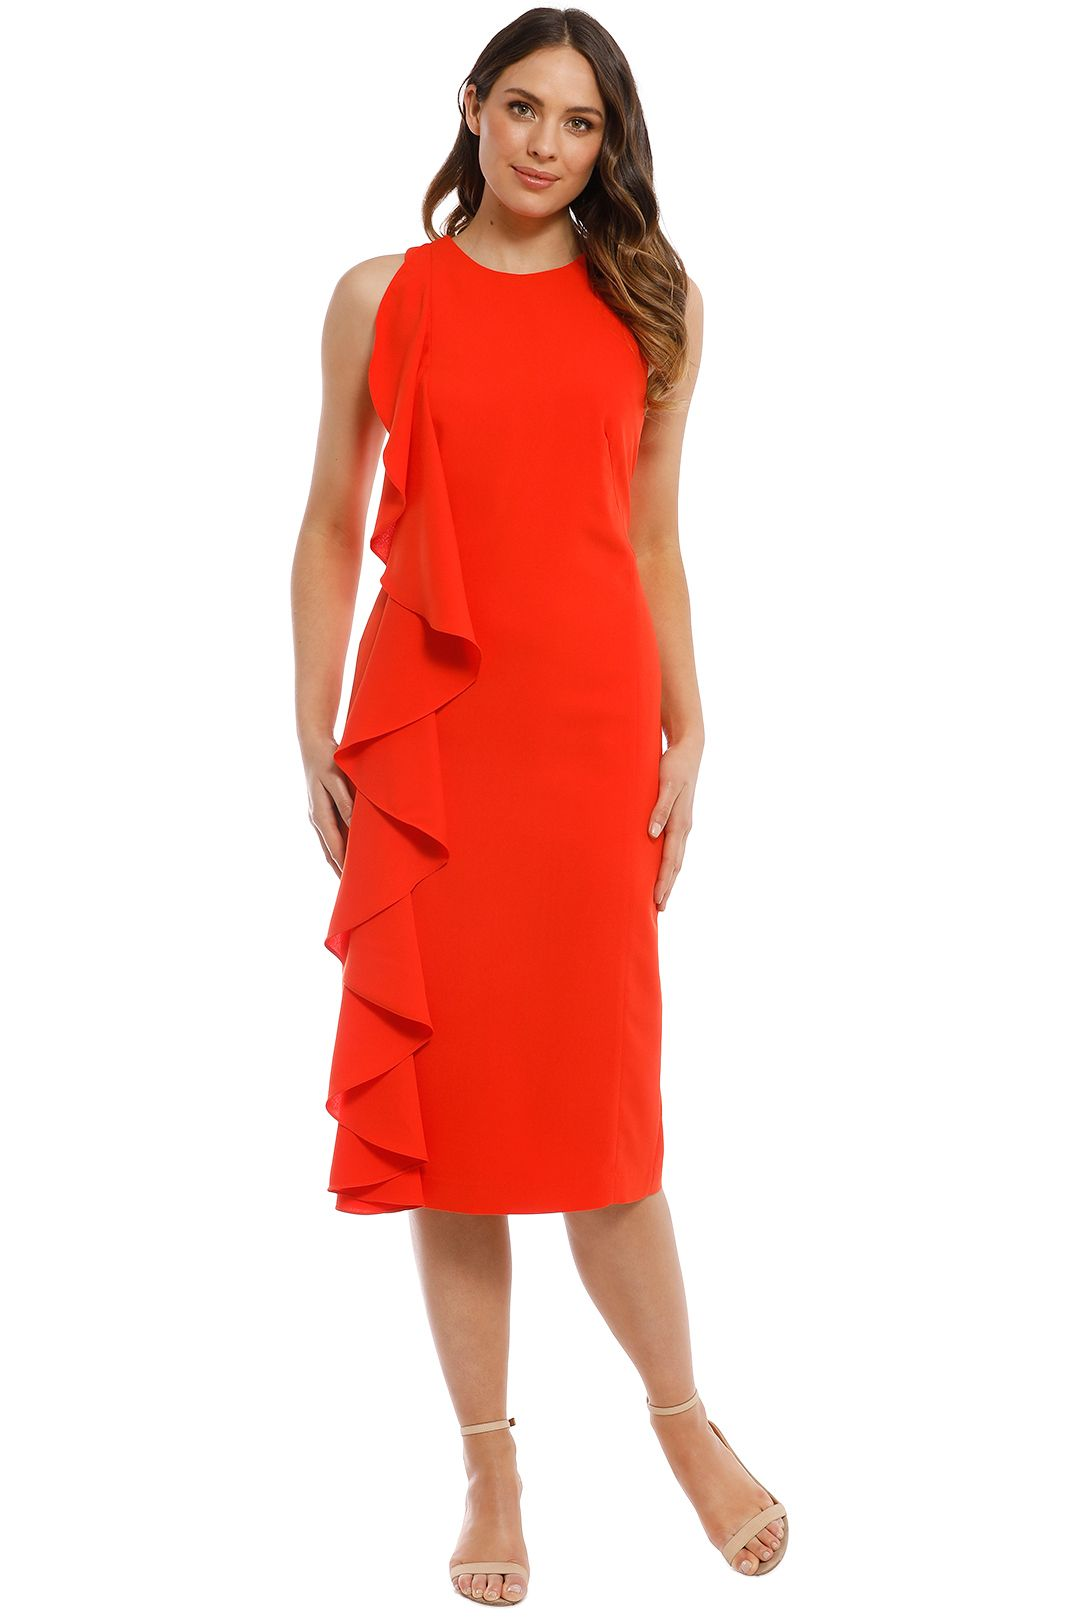 Trelise Cooper - Light My Fire Dress - Tangerine - Front